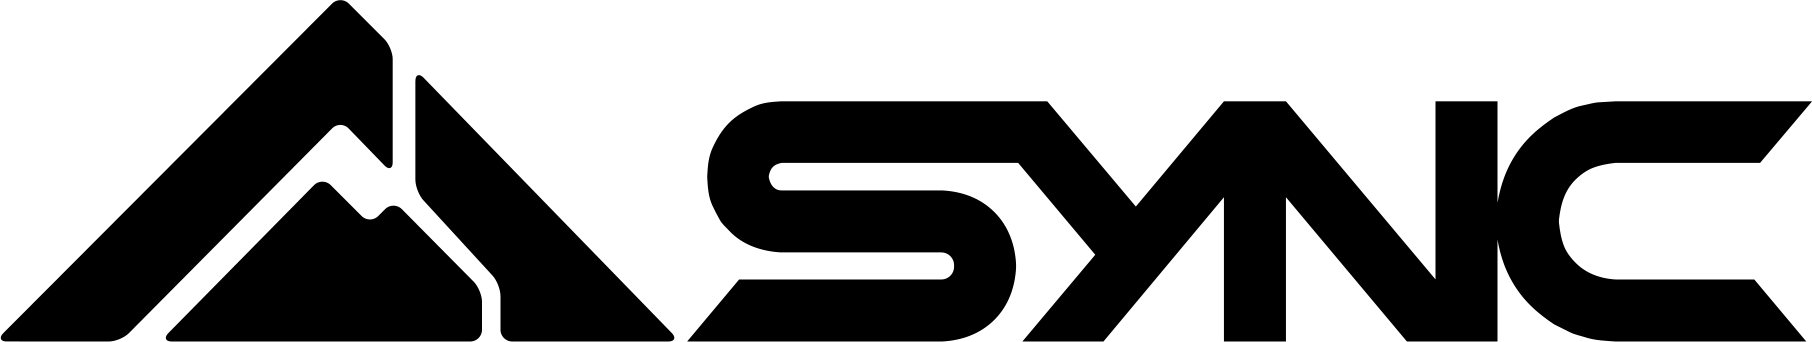 sync-logo-horizontal.png